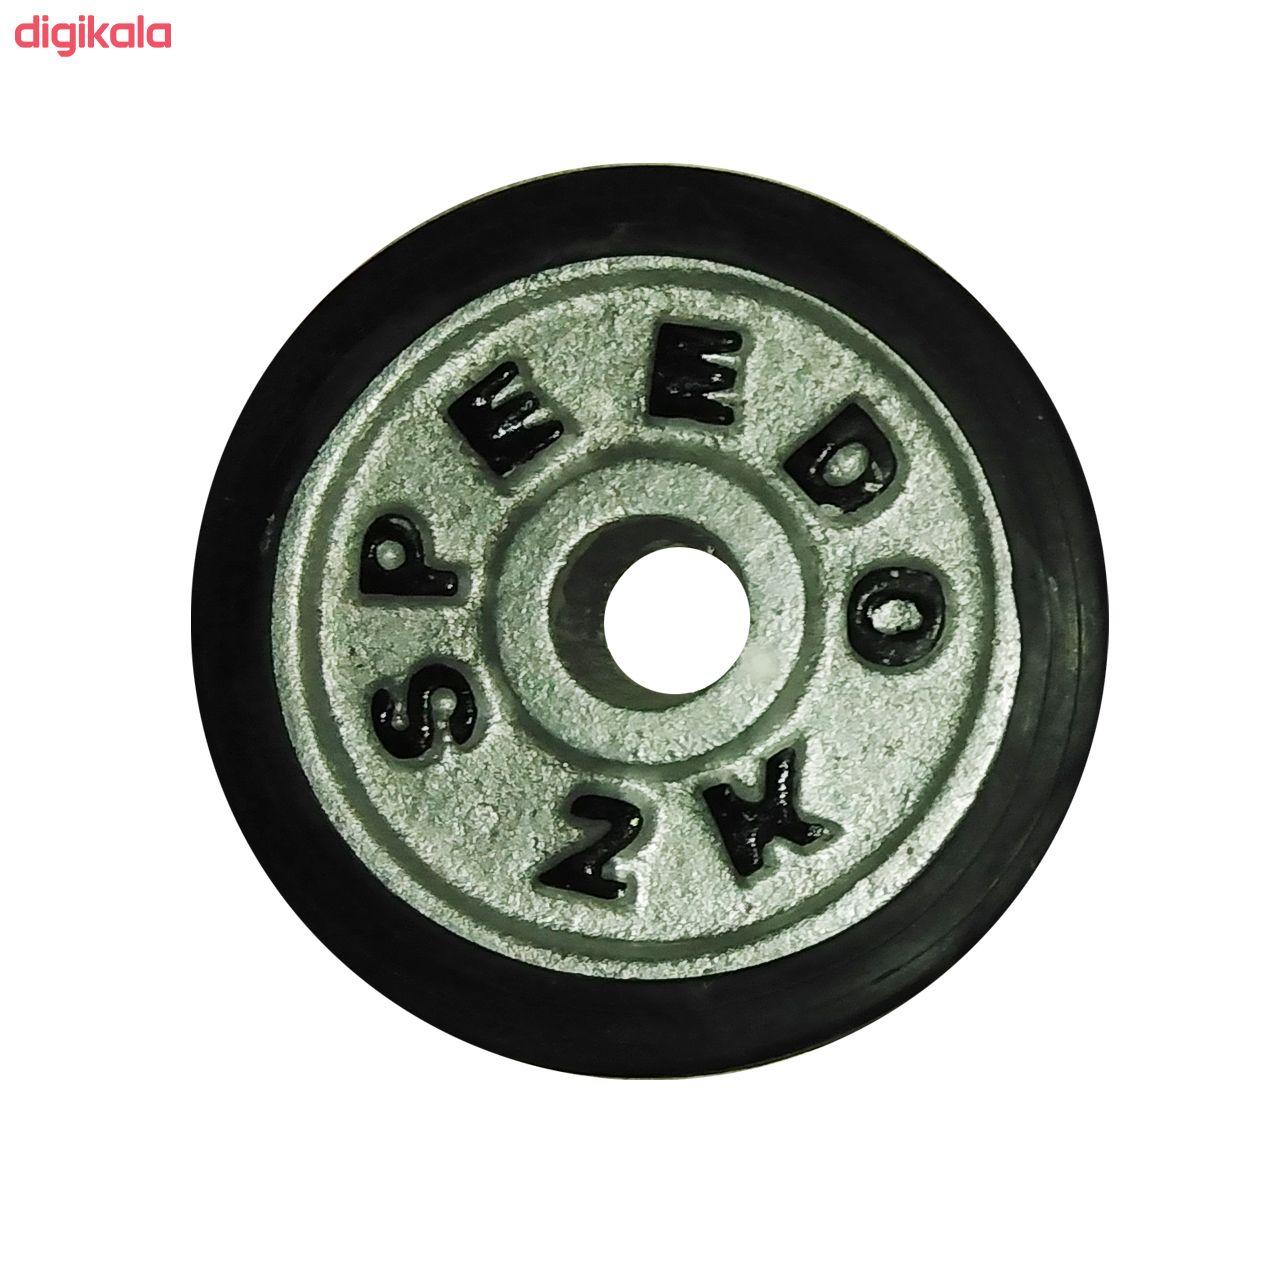 وزنه دمبل اسپیدو مدل 008 وزن 2 کیلوگرم بسته 2 عددی main 1 1